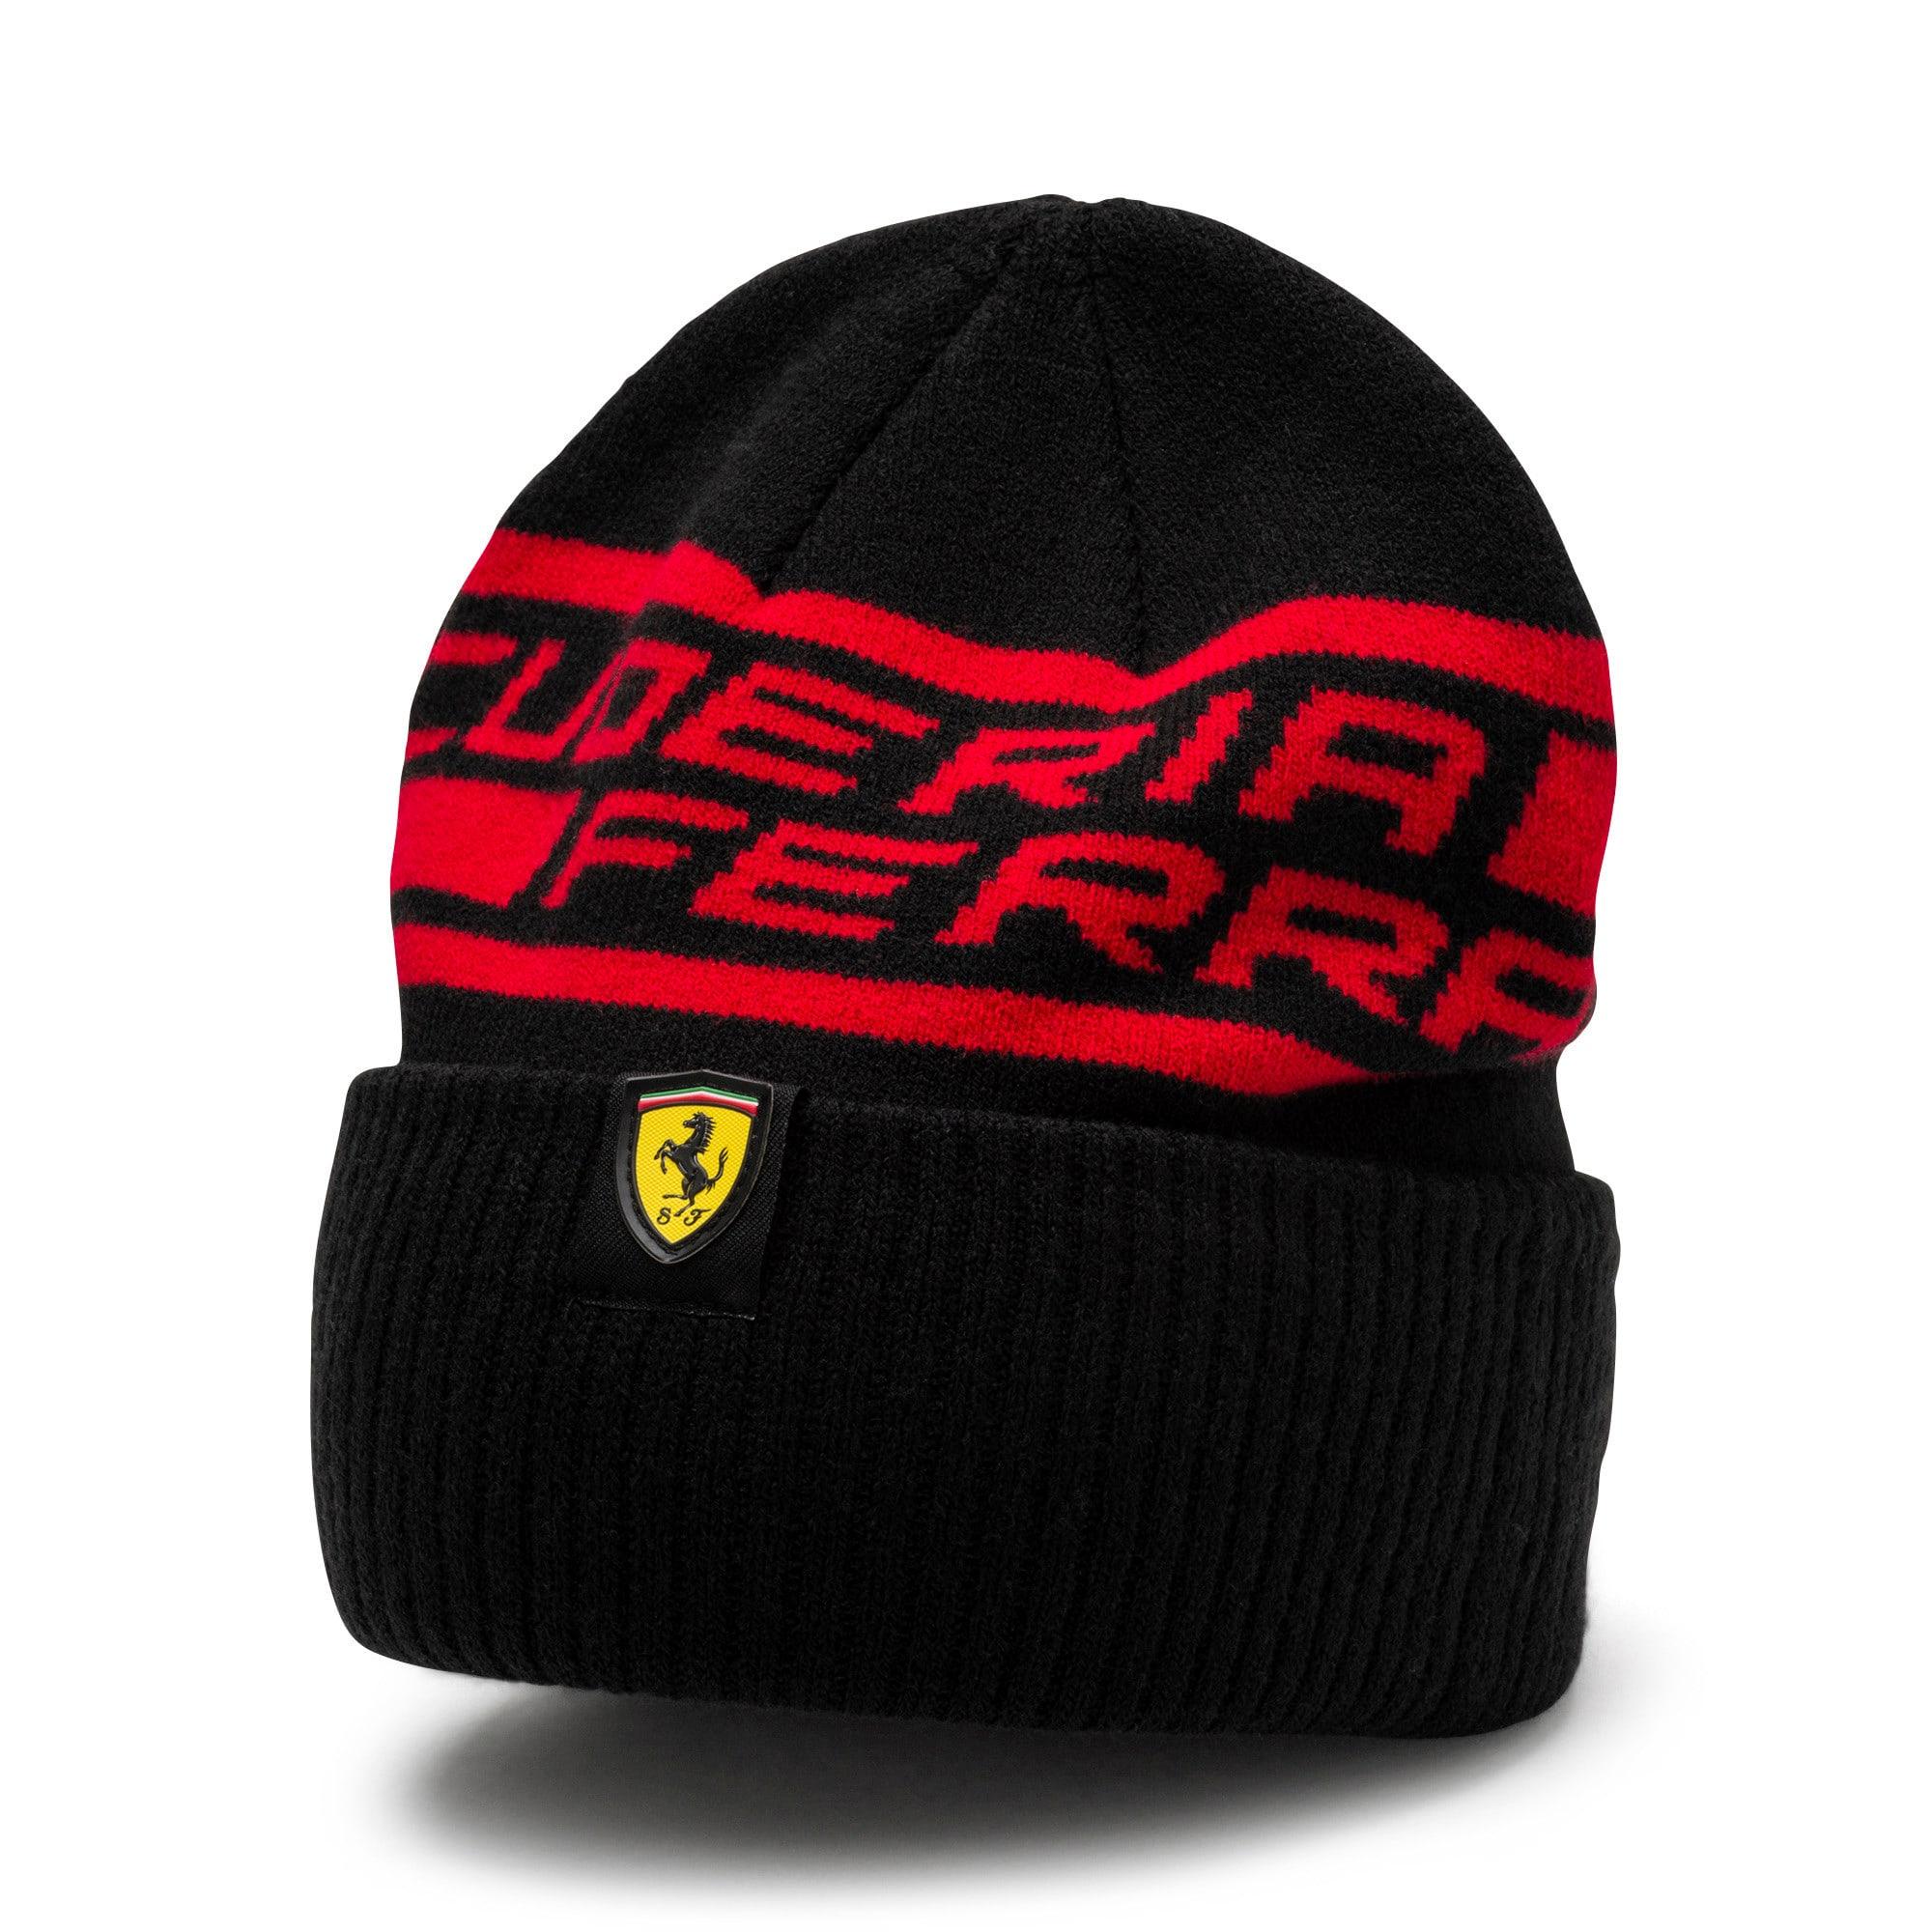 Thumbnail 1 of Ferrari Fan Beanie, Puma Black, medium-IND